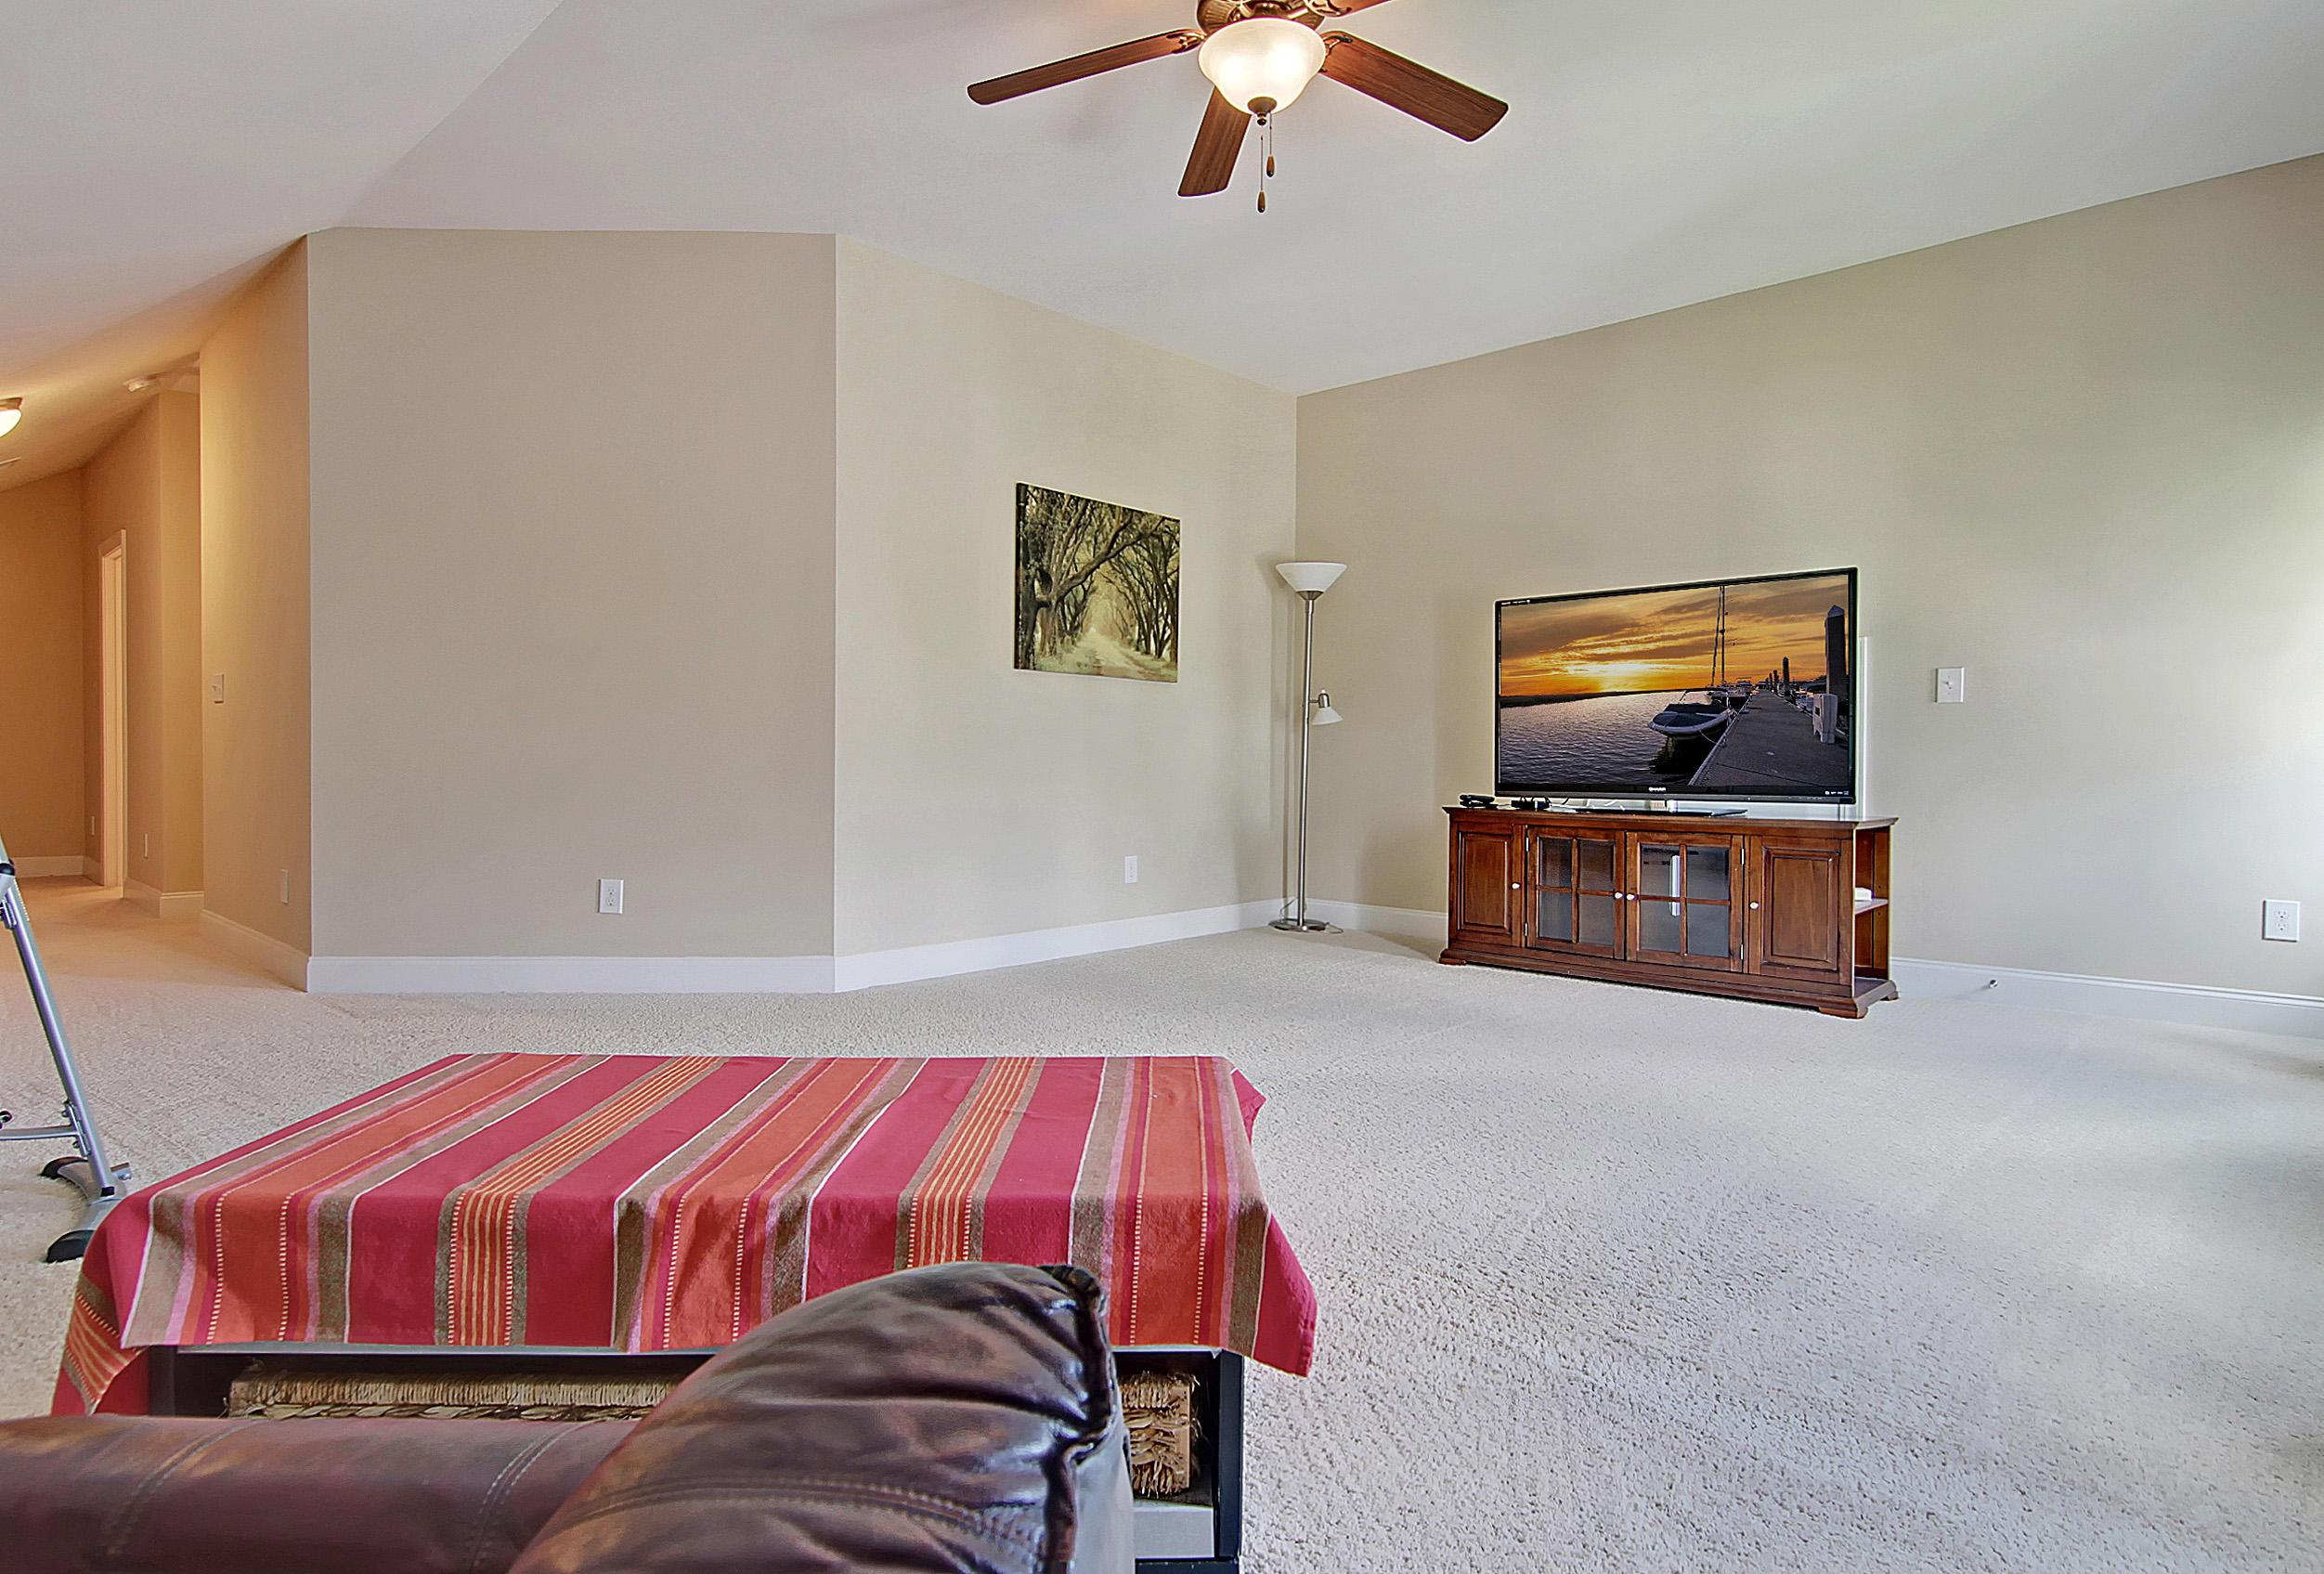 Dunes West Homes For Sale - 1332 Whisker Pole, Mount Pleasant, SC - 35